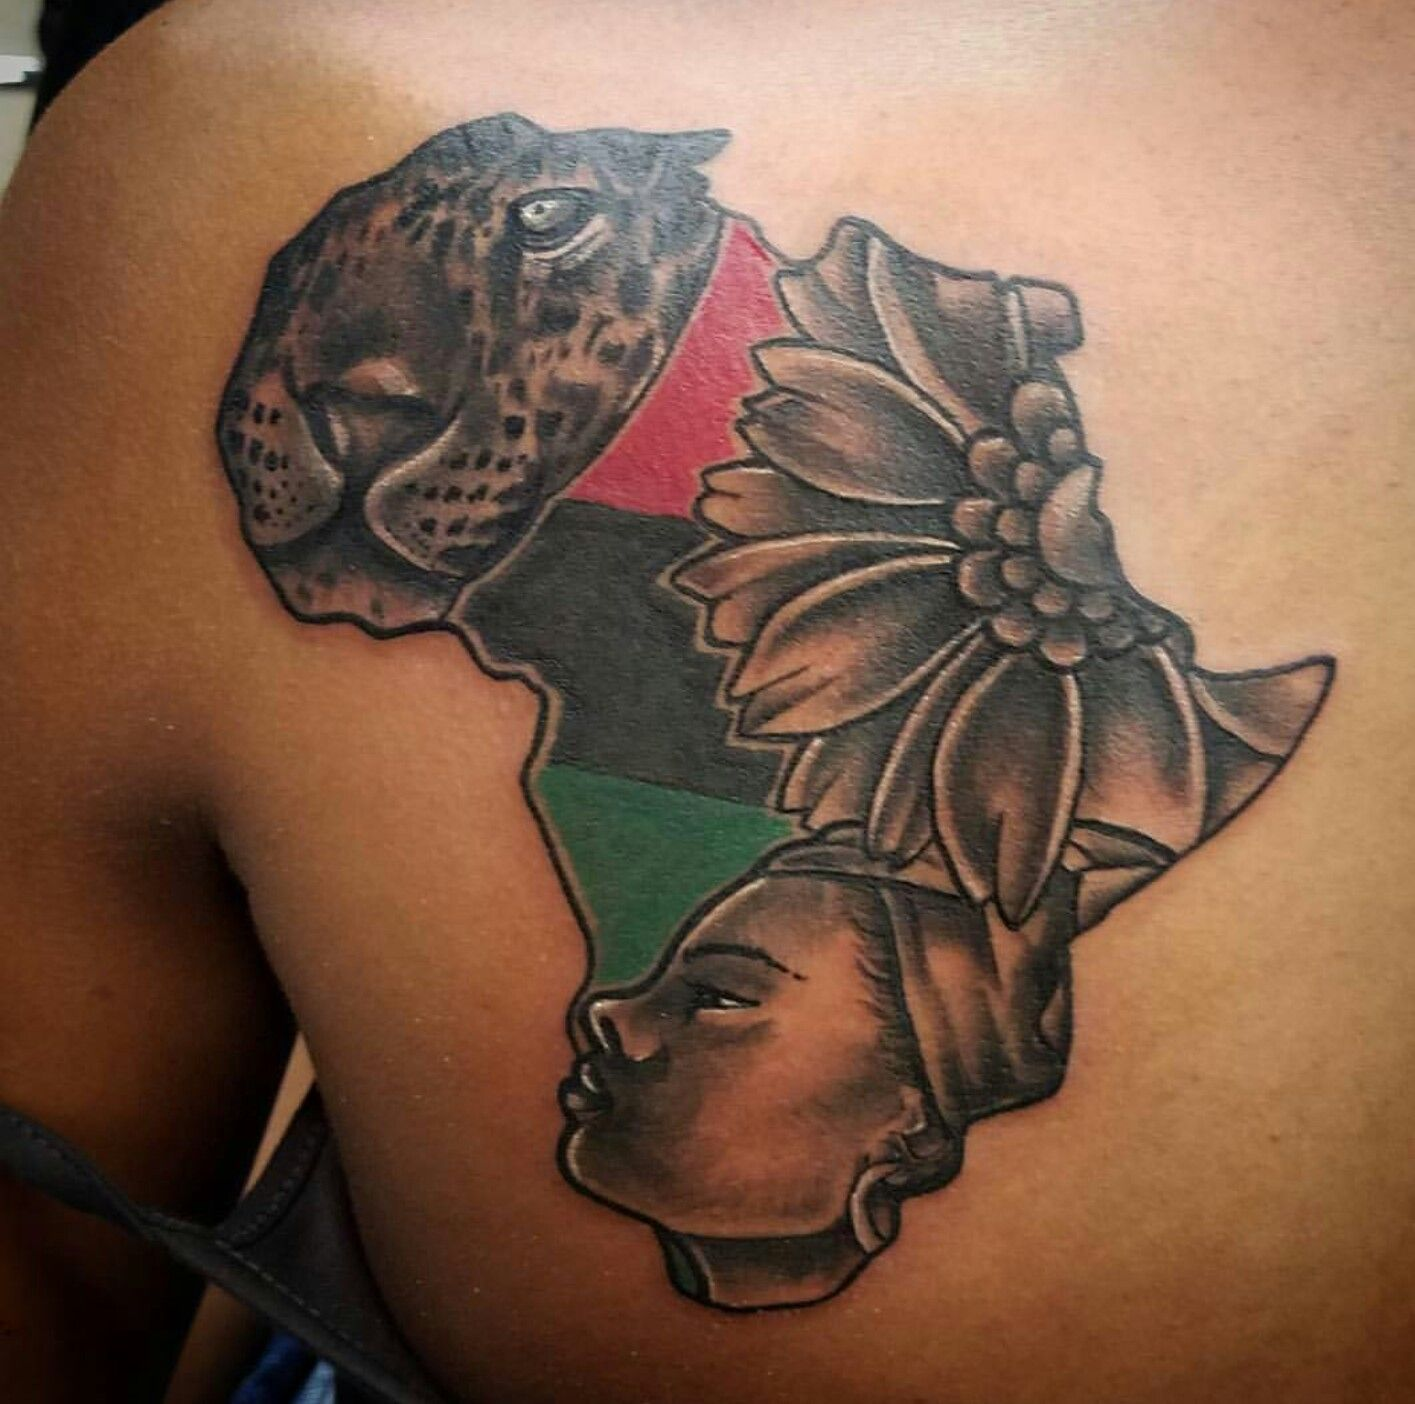 mama africa tattoo tattoo fine art pinterest africa tattoos africa and tattoo. Black Bedroom Furniture Sets. Home Design Ideas